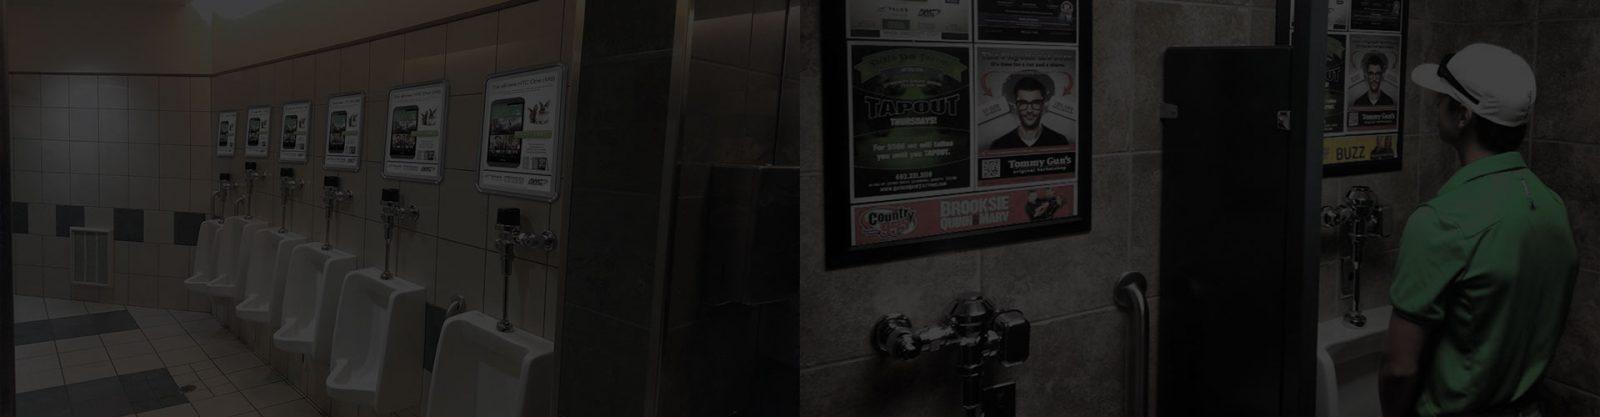 Lavatory Advertising